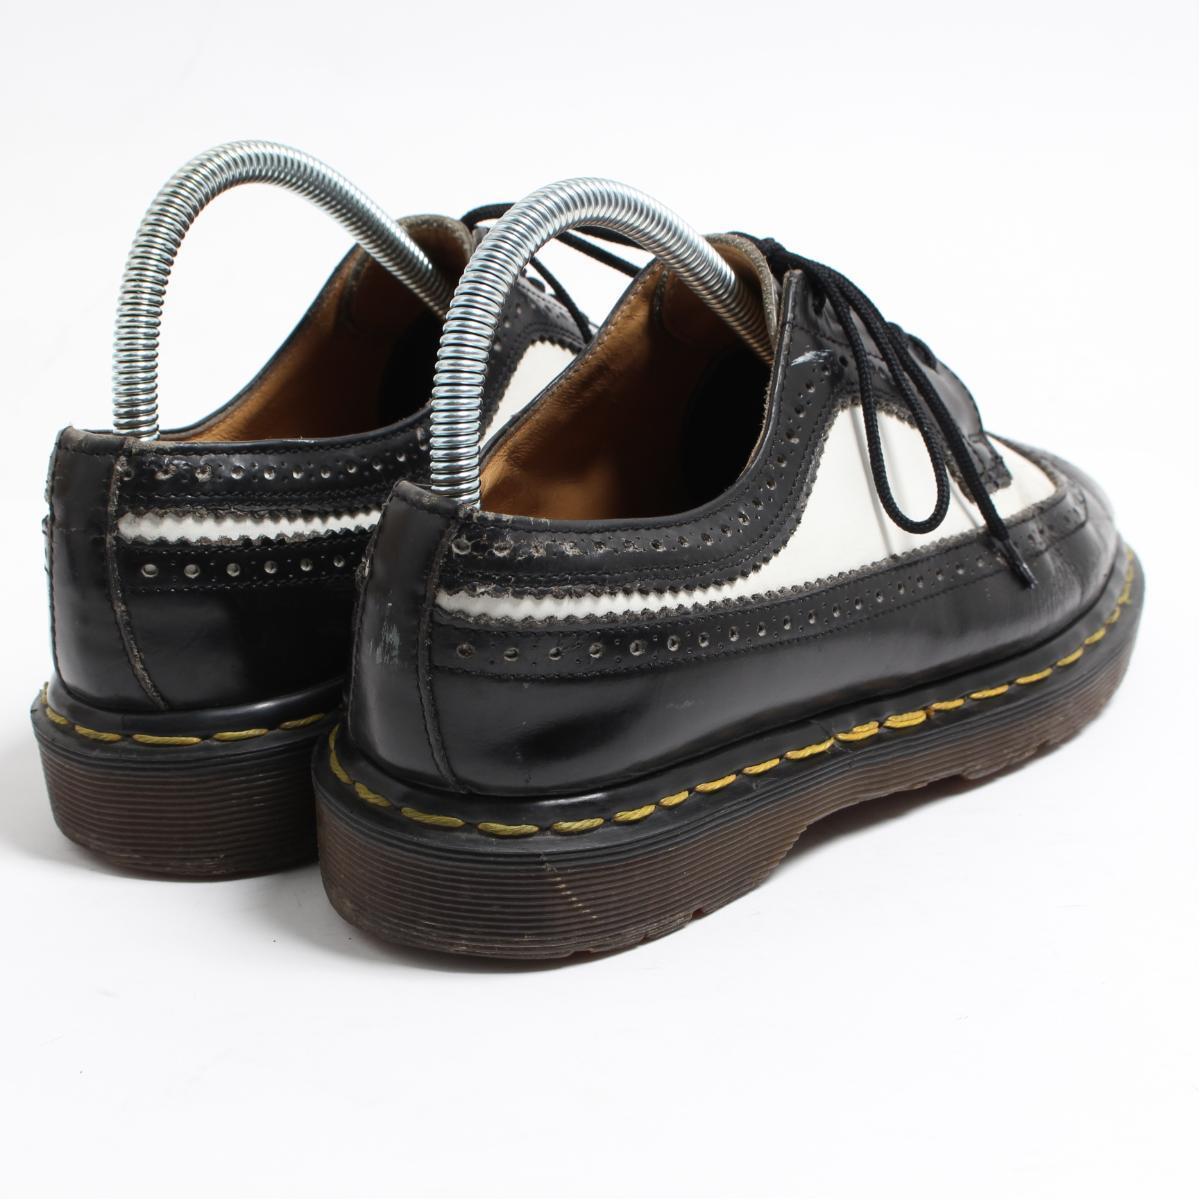 UK7 men 25.5cm /boo3503 made in the doctor Martin Dr.Martens wing tip shoes U.K.